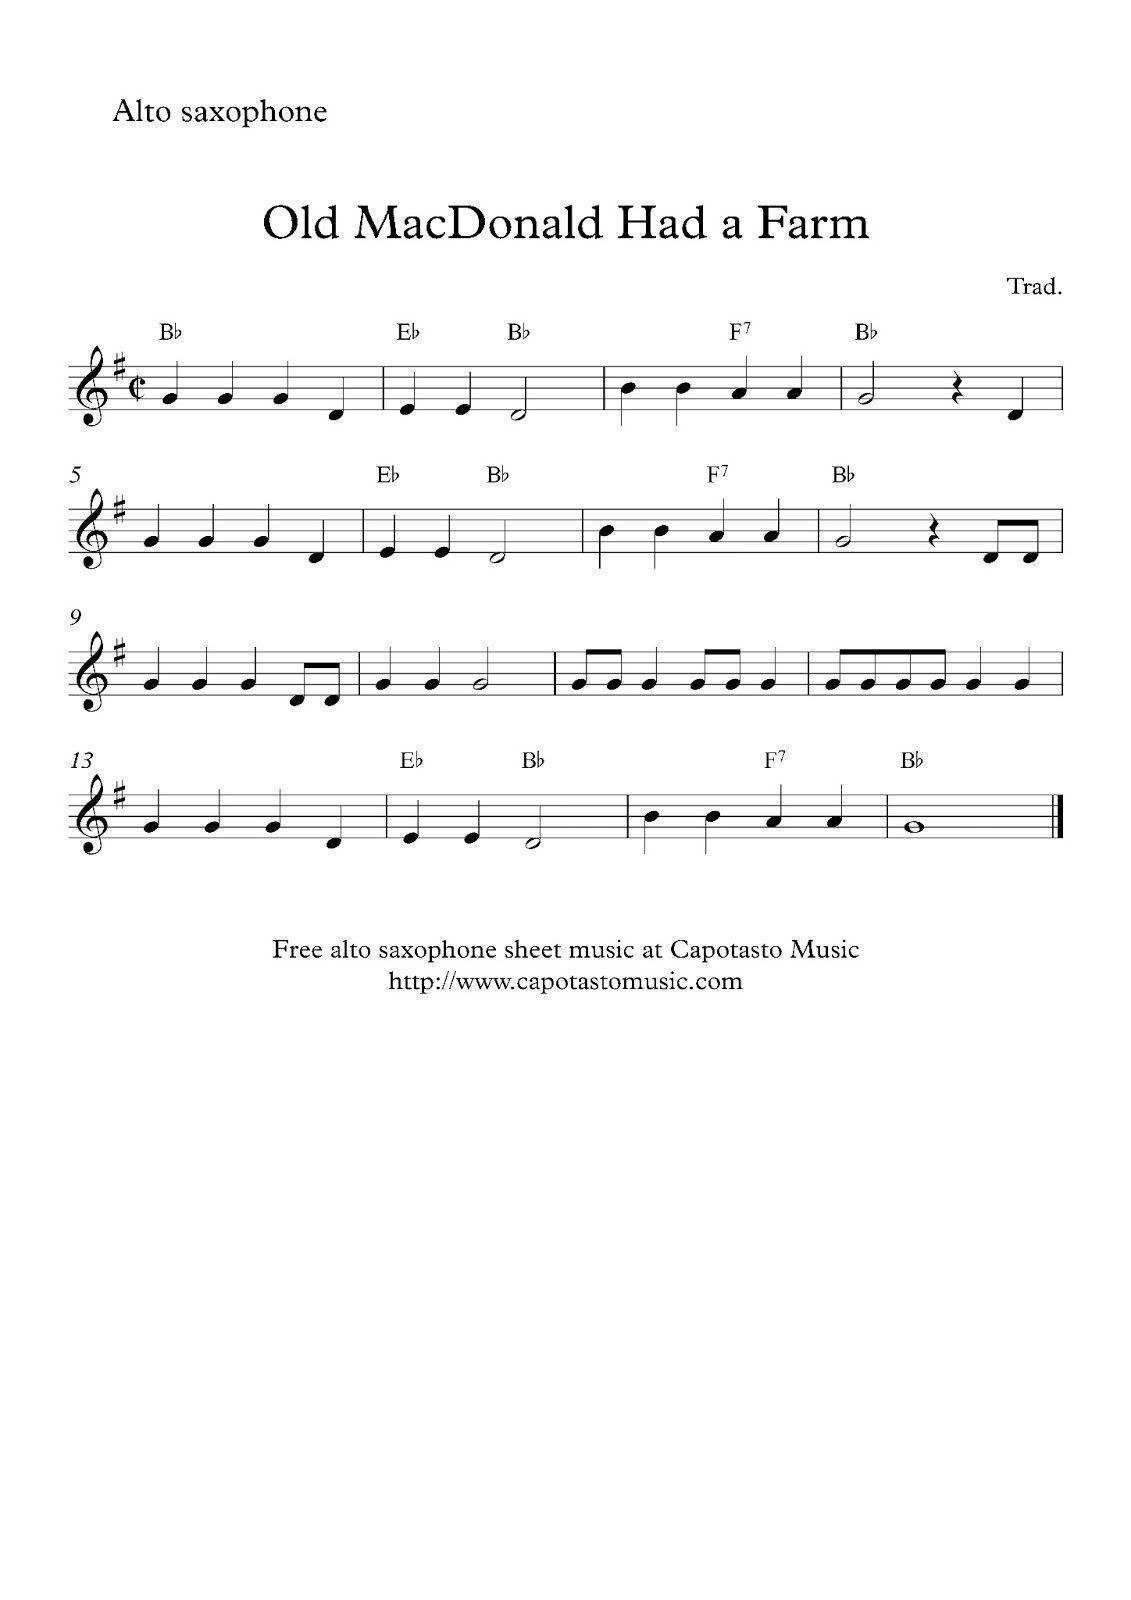 Alto Sax Easy Songs | Free Sheet Music Scores: Free Easy Alto - Free Printable Alto Saxophone Sheet Music